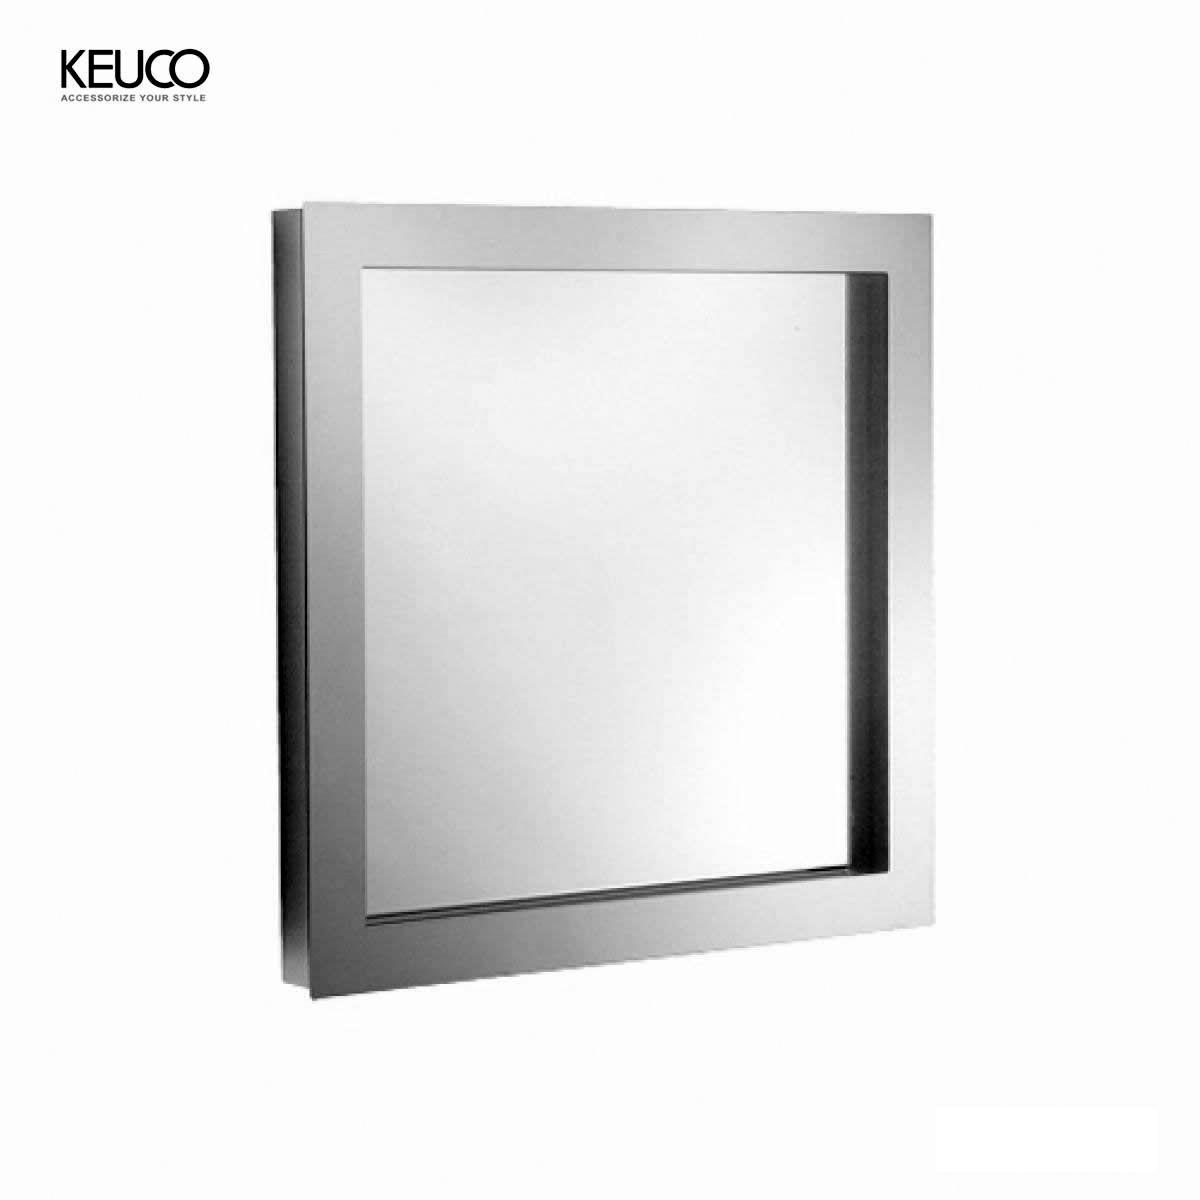 Keuco Edition 300 Light Mirror Uk Bathrooms